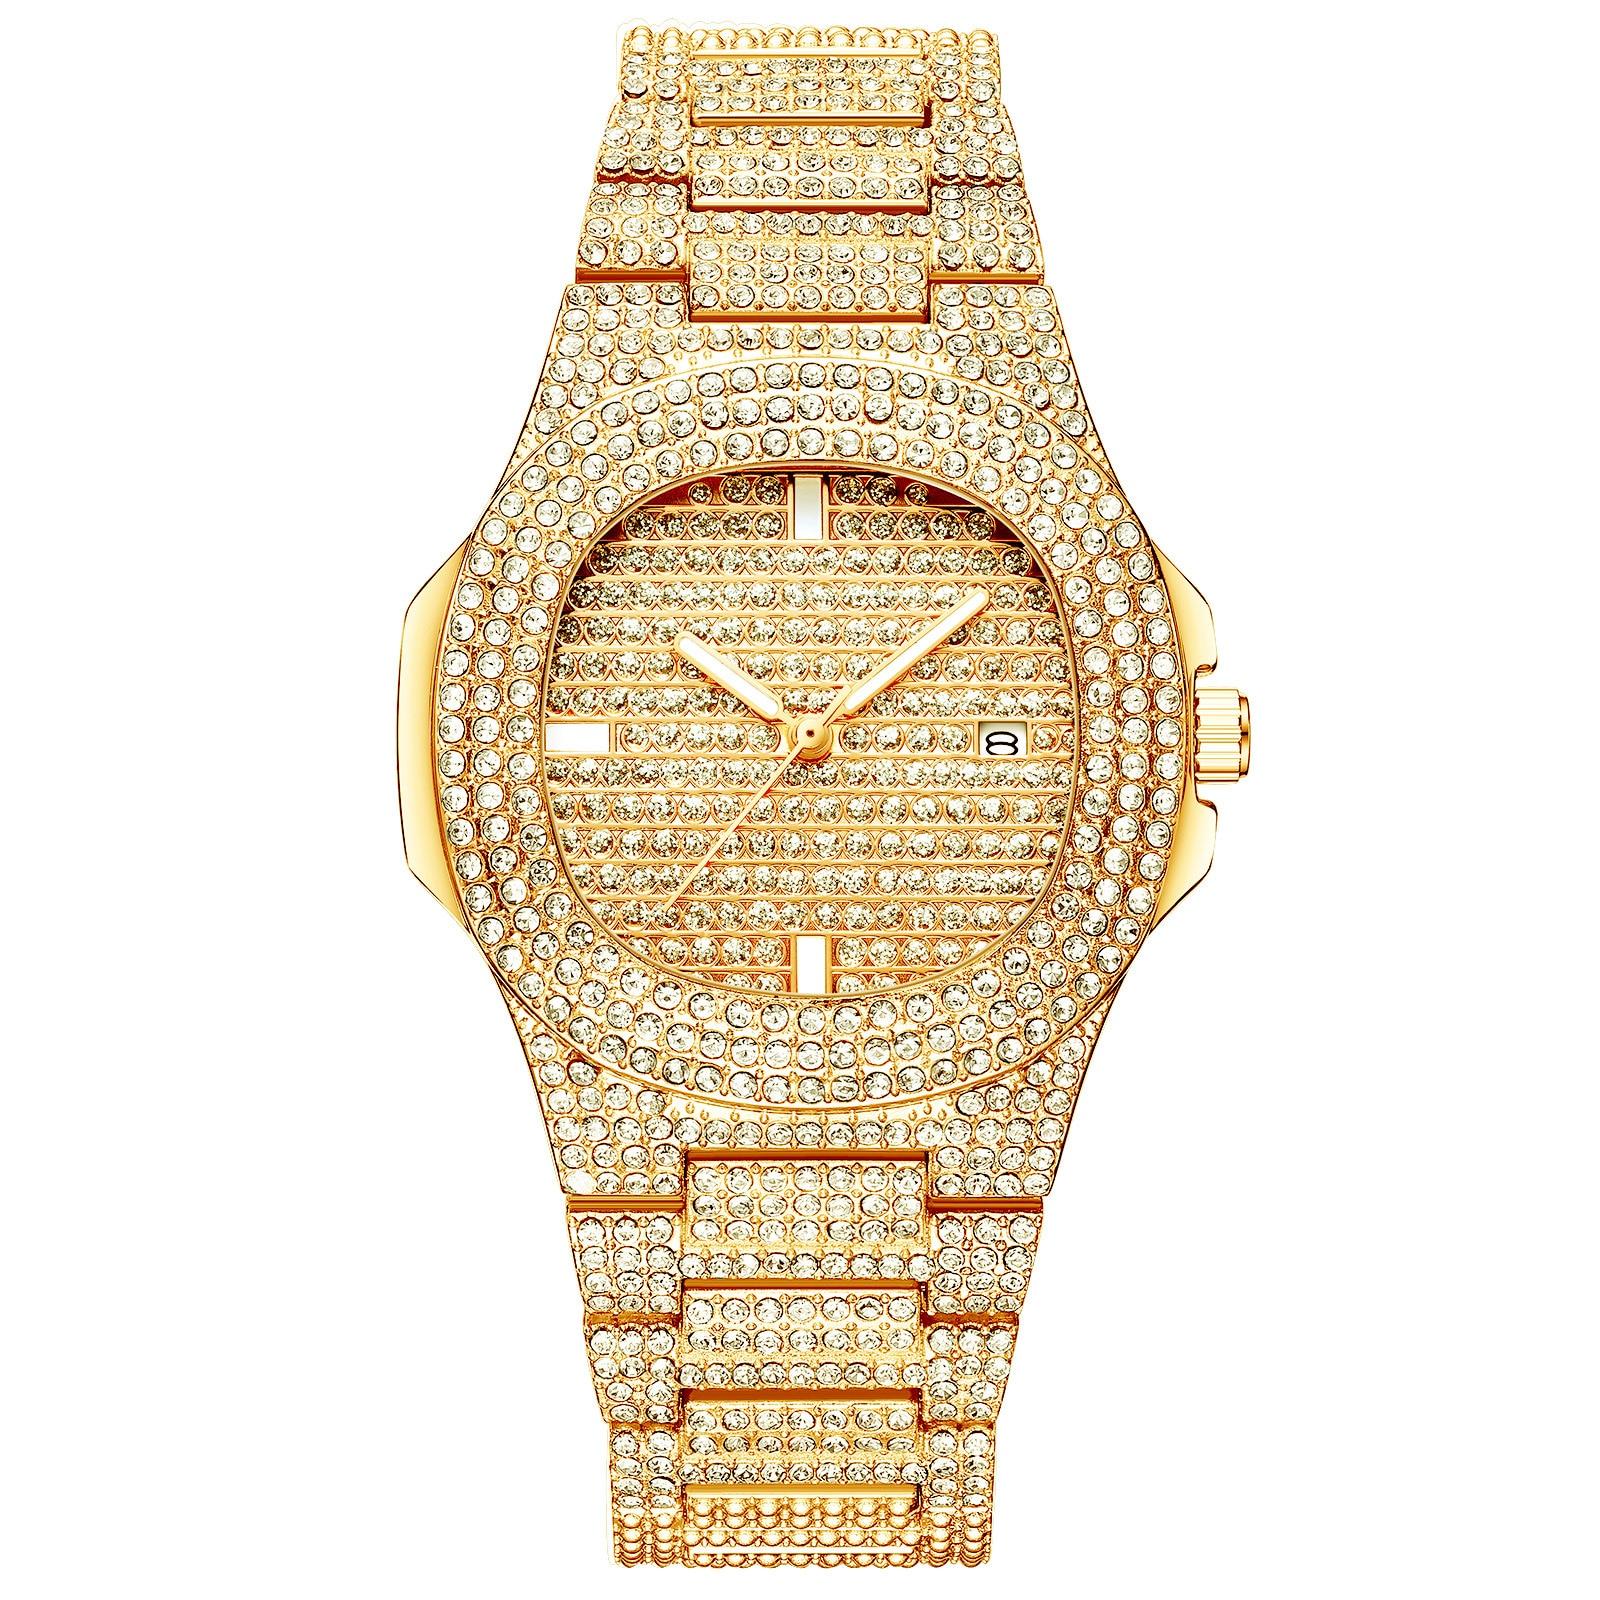 2020 Luxury Diamond Women Watches Hot Sell Fashion Calendar Waterproof Wristwatch for Female Gold Quartz Clock relógios feminino enlarge